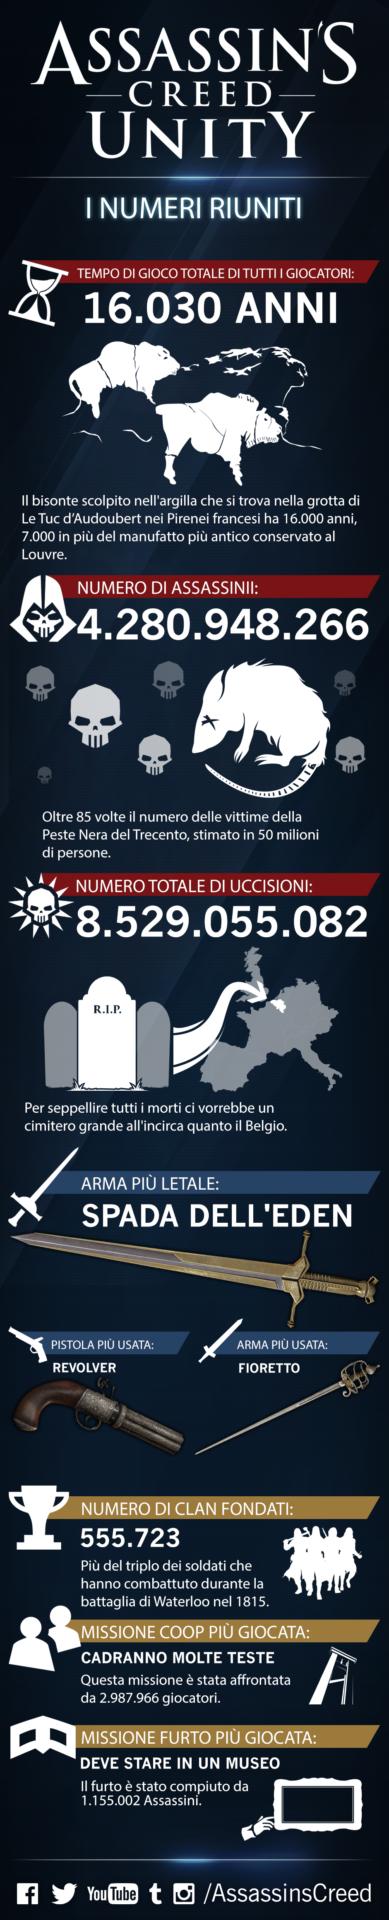 assassin-s-creed-unity-infografica